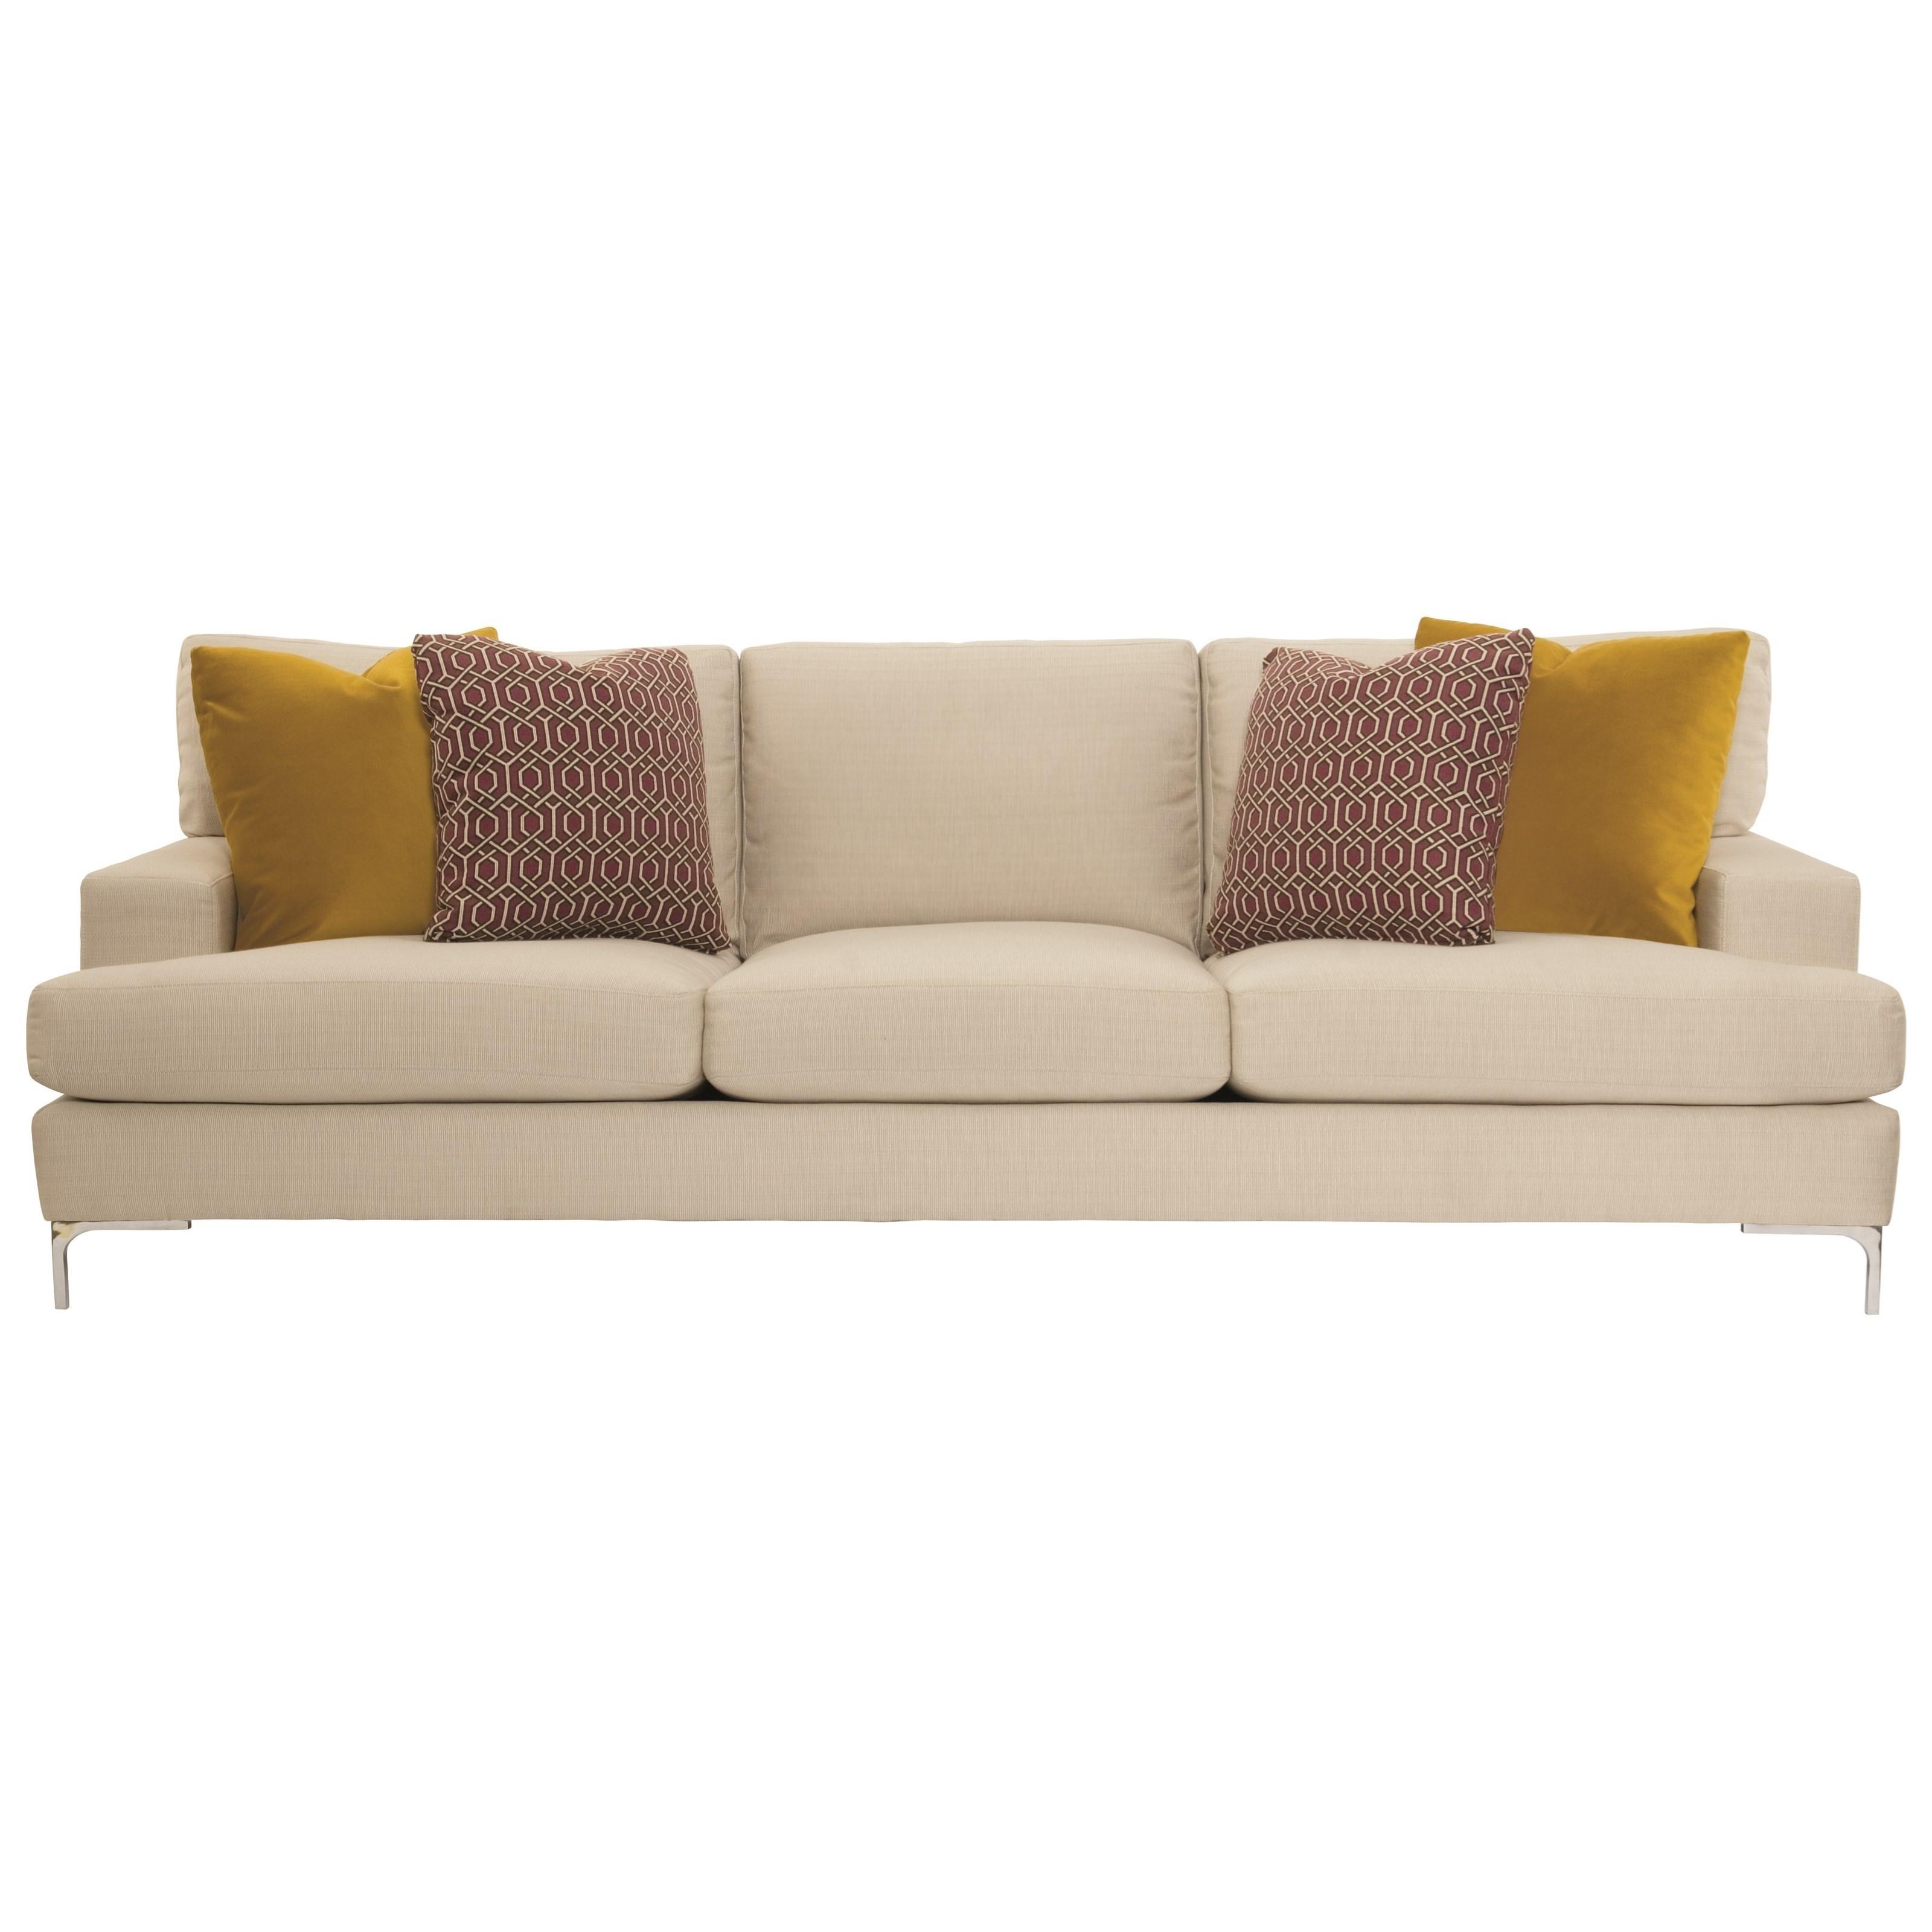 Delicieux Bernhardt Carver Sofa